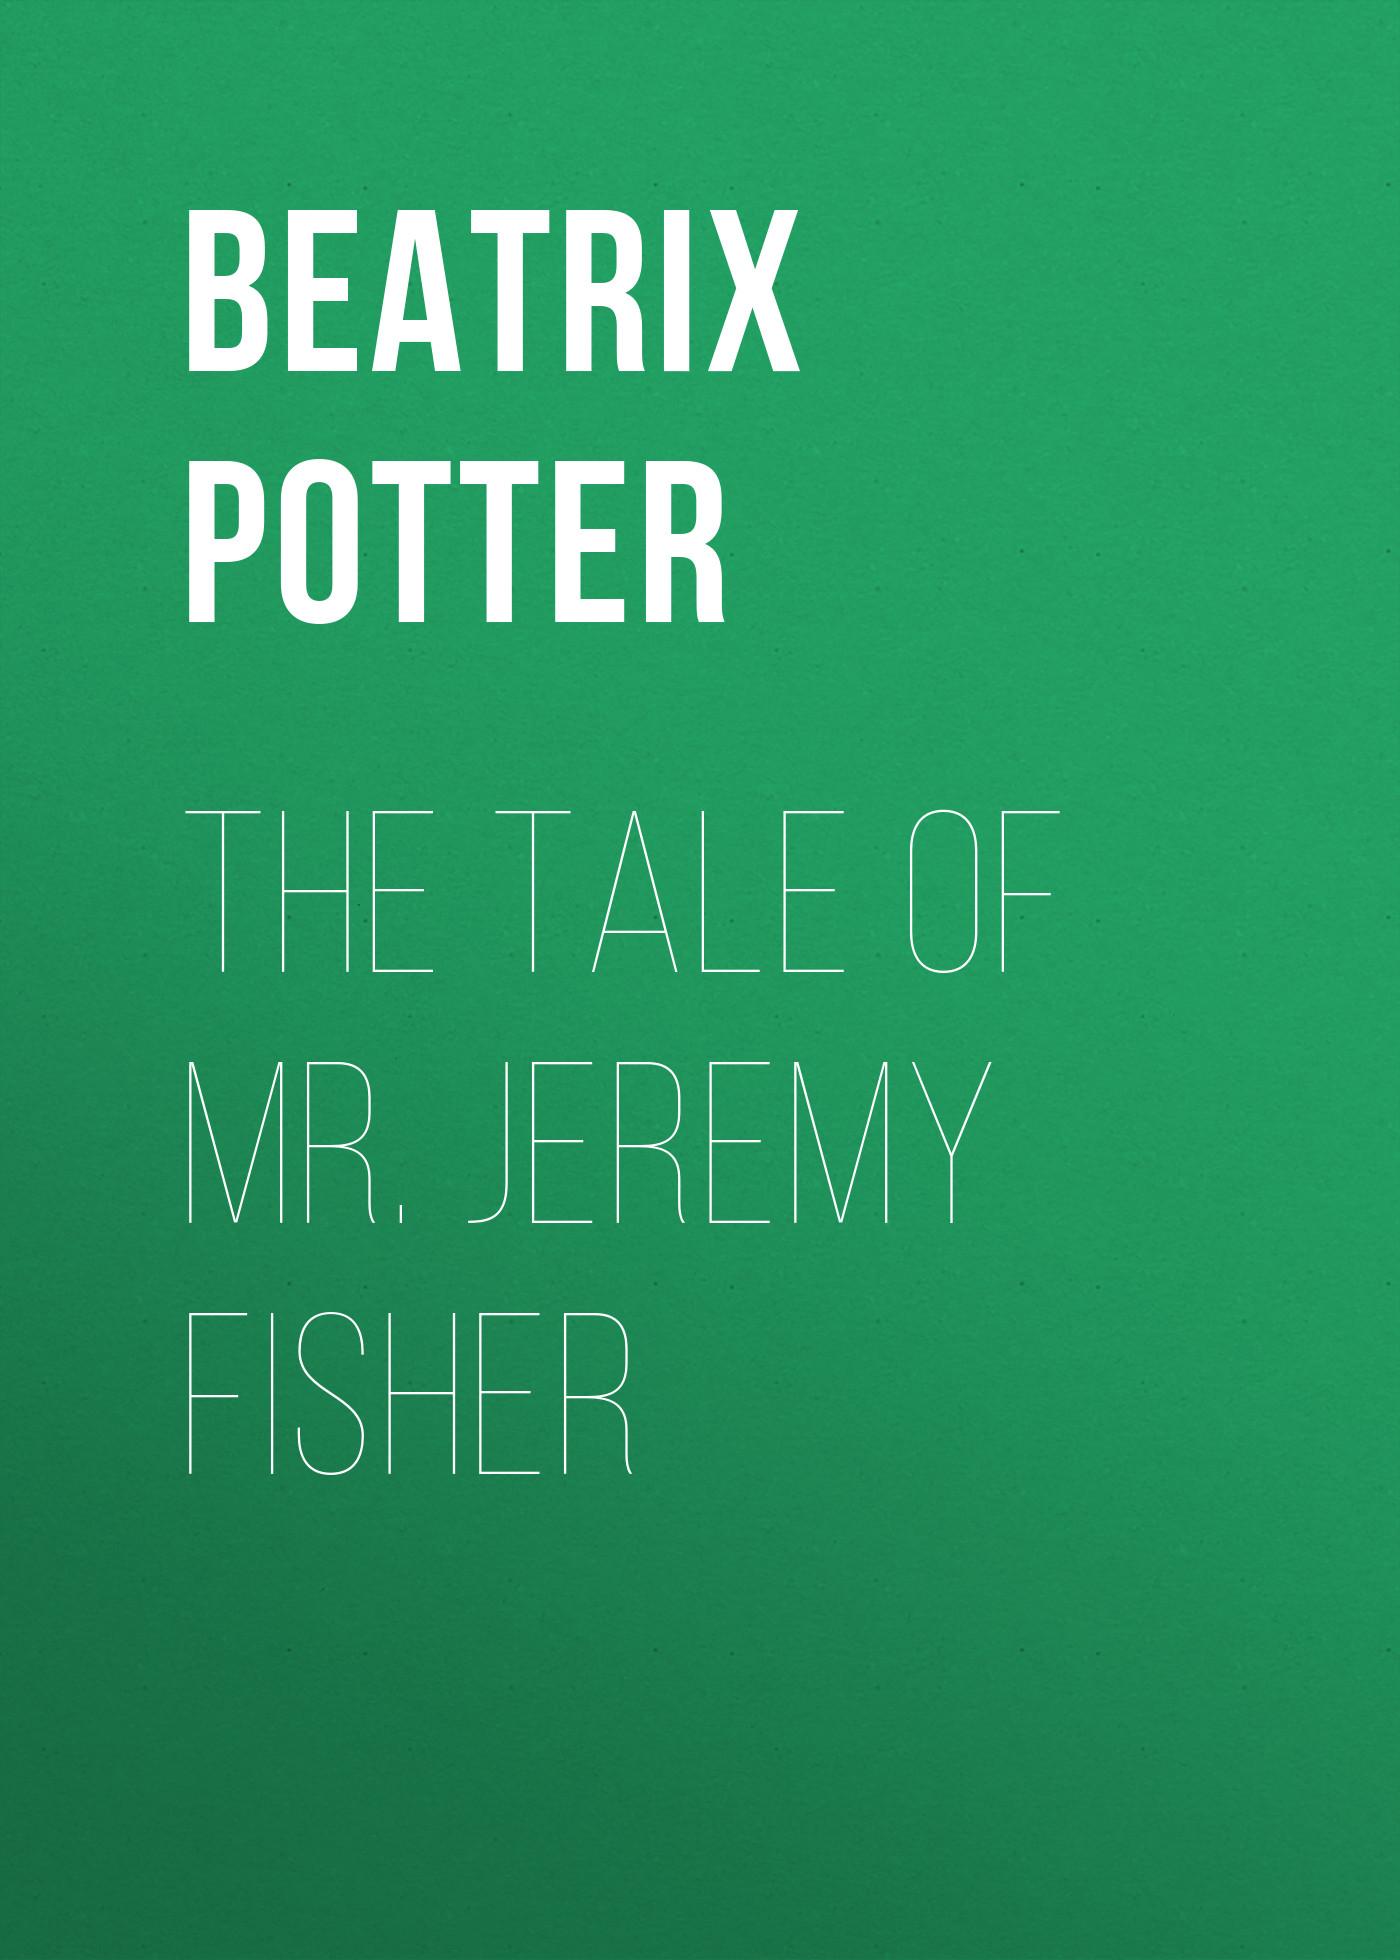 Беатрис Поттер The Tale of Mr. Jeremy Fisher